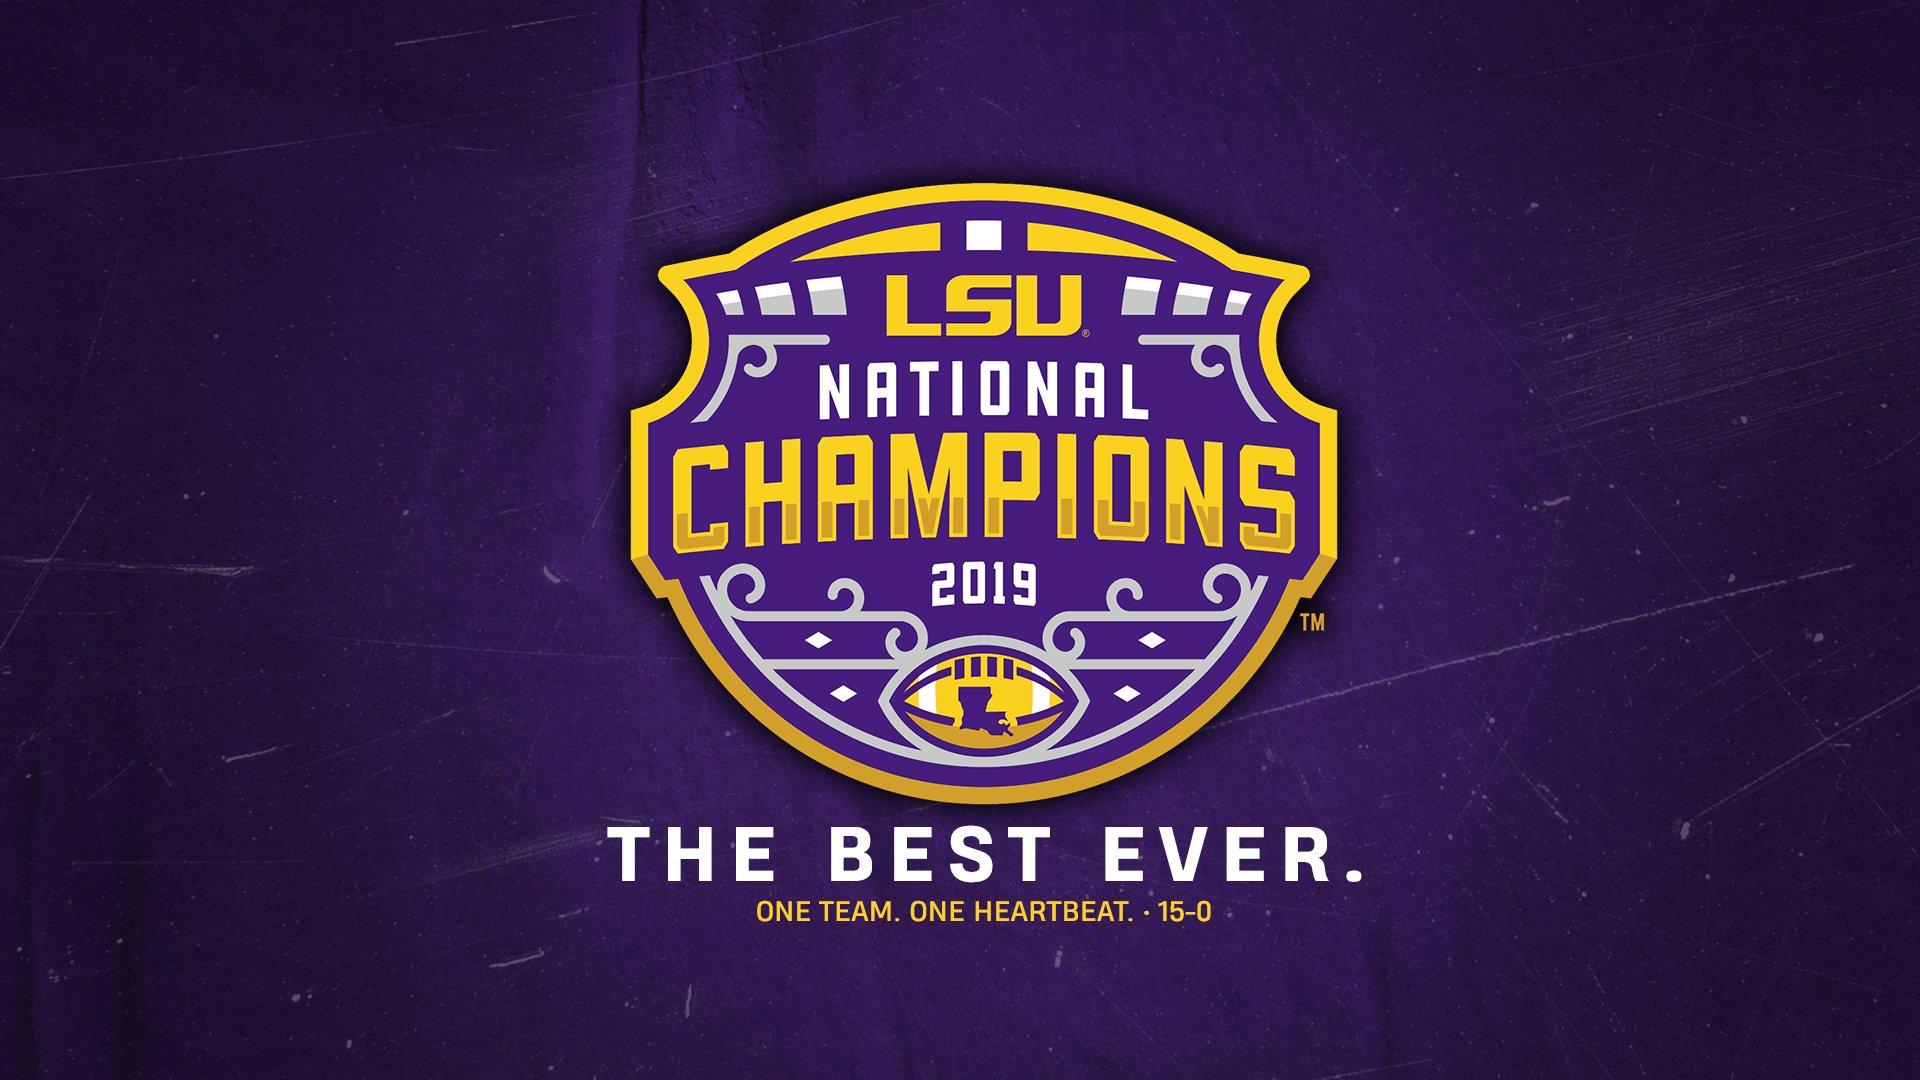 Alabama Starting Lineup >> Desktop Wallpaper for the official National Championship ...